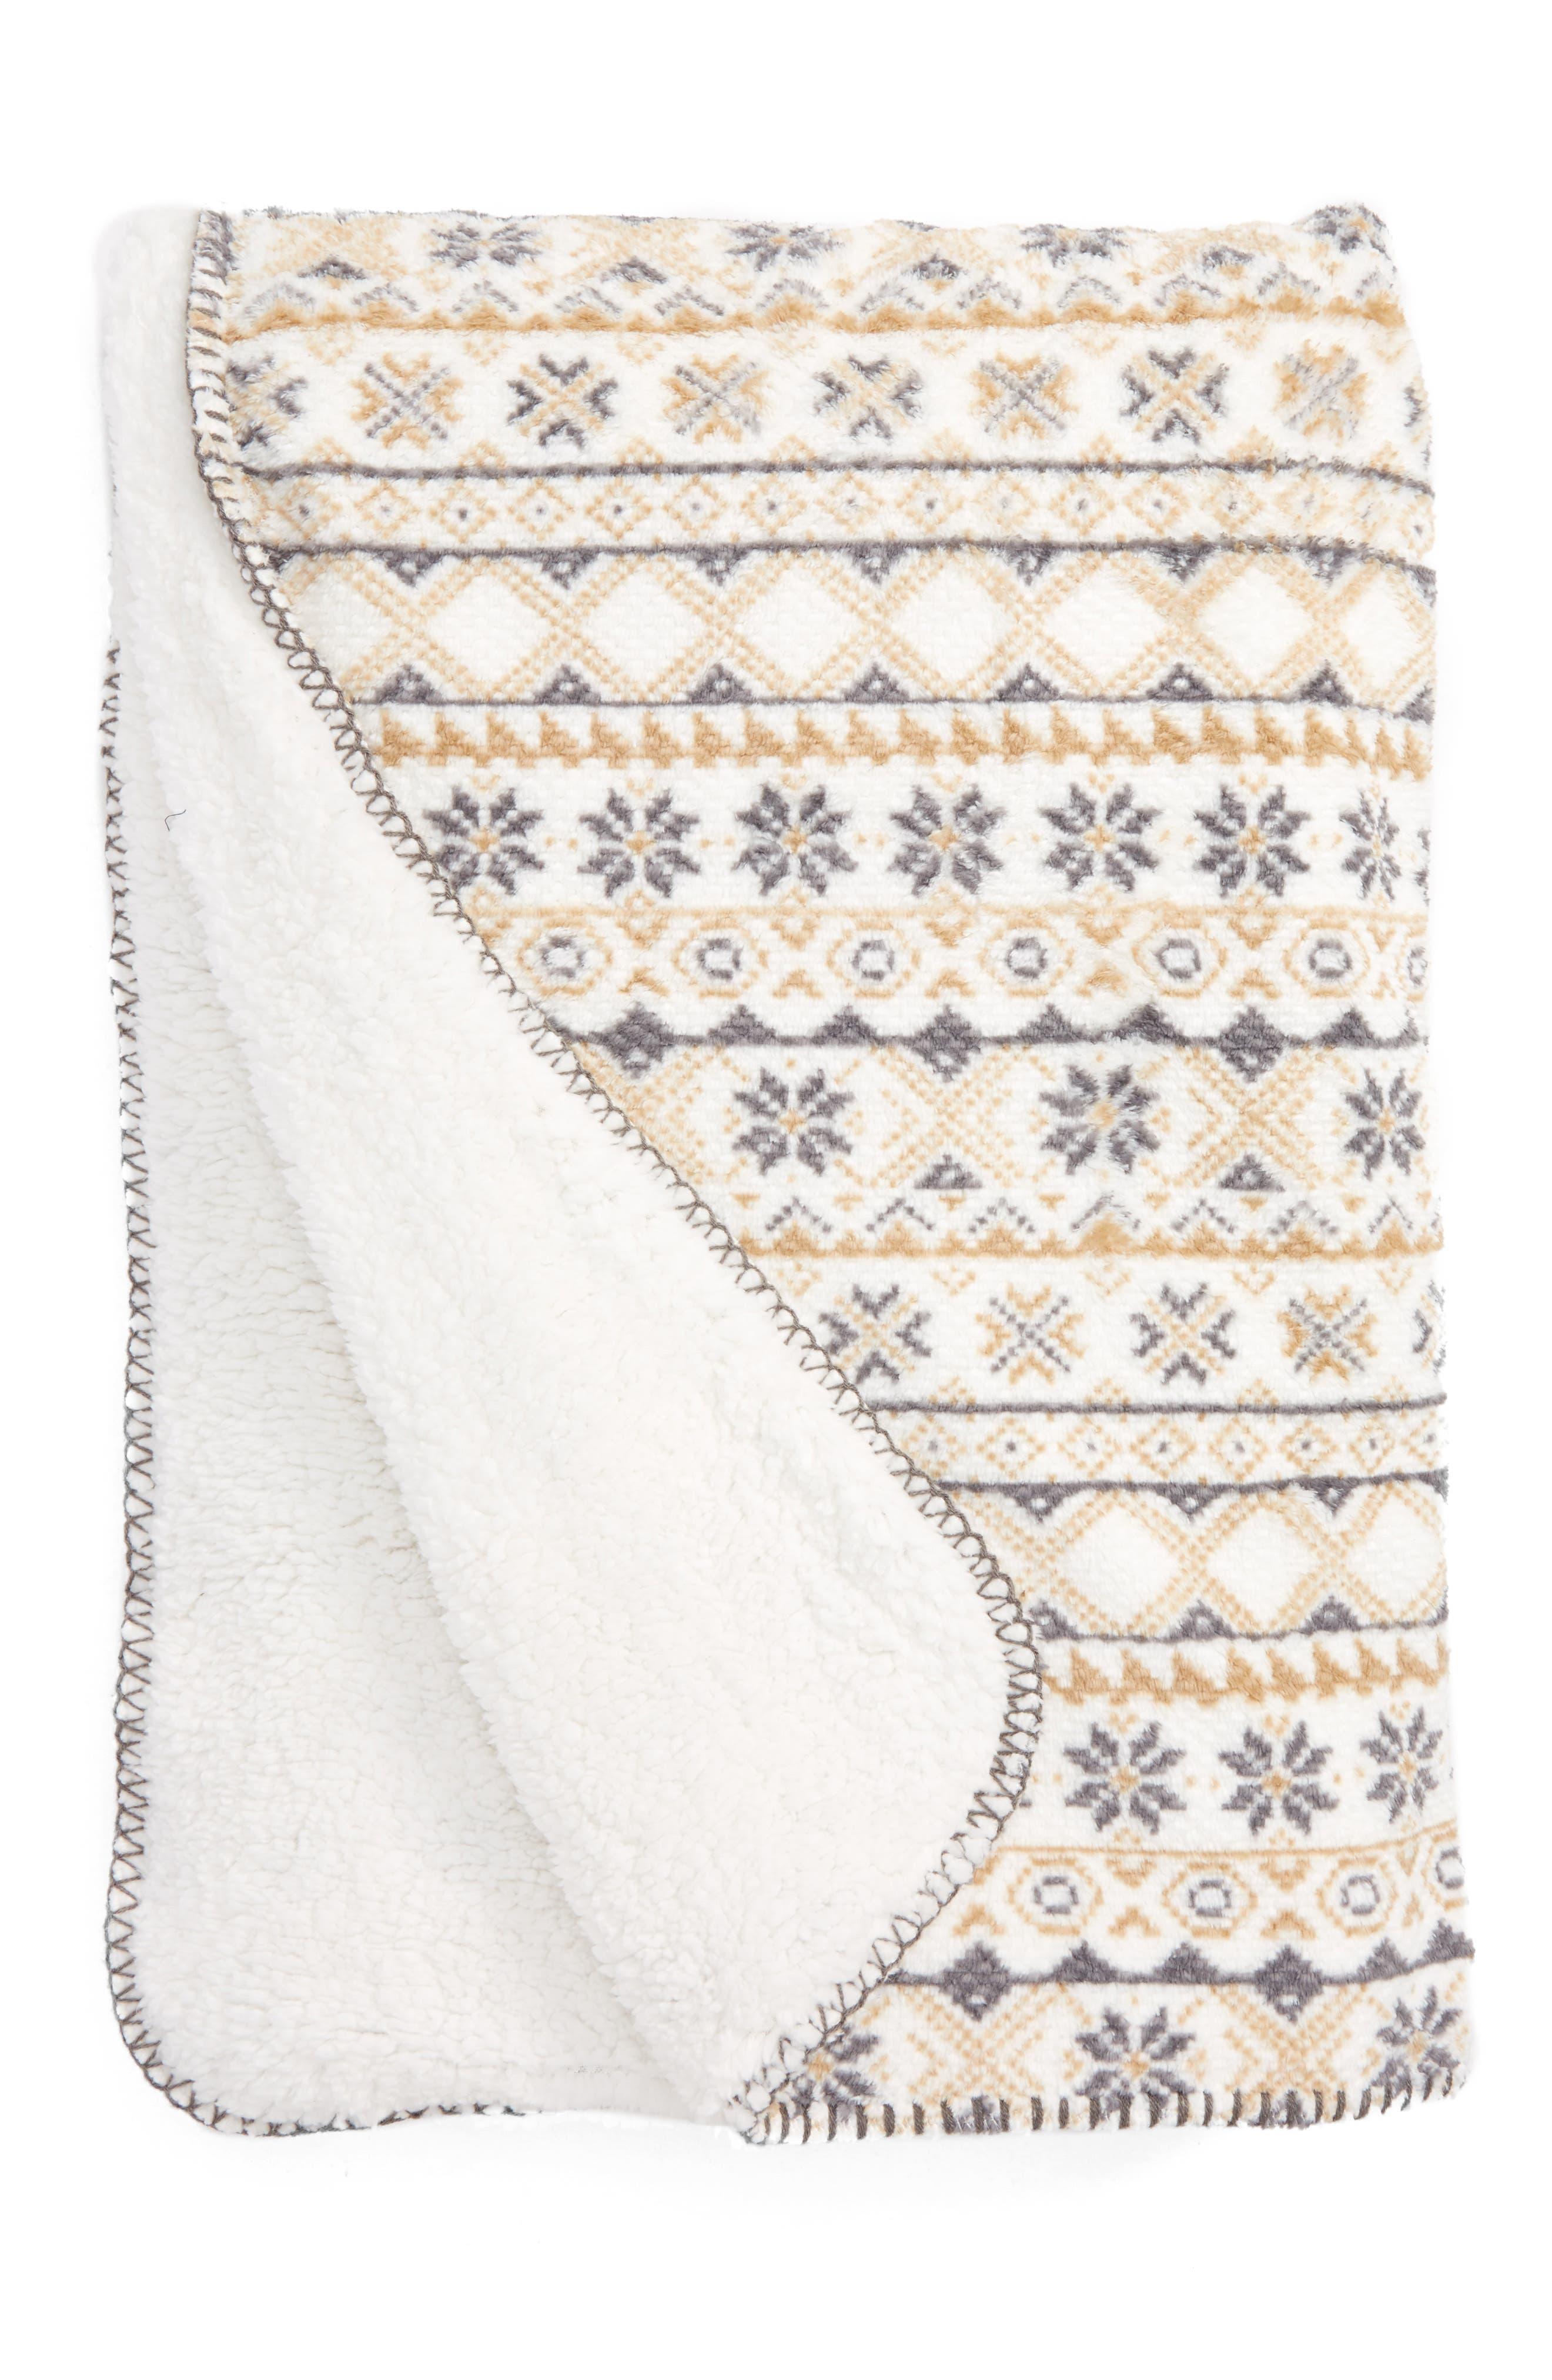 Alternate Image 1 Selected - PJ Salvage Fair Isle Print Faux Shearling Blanket